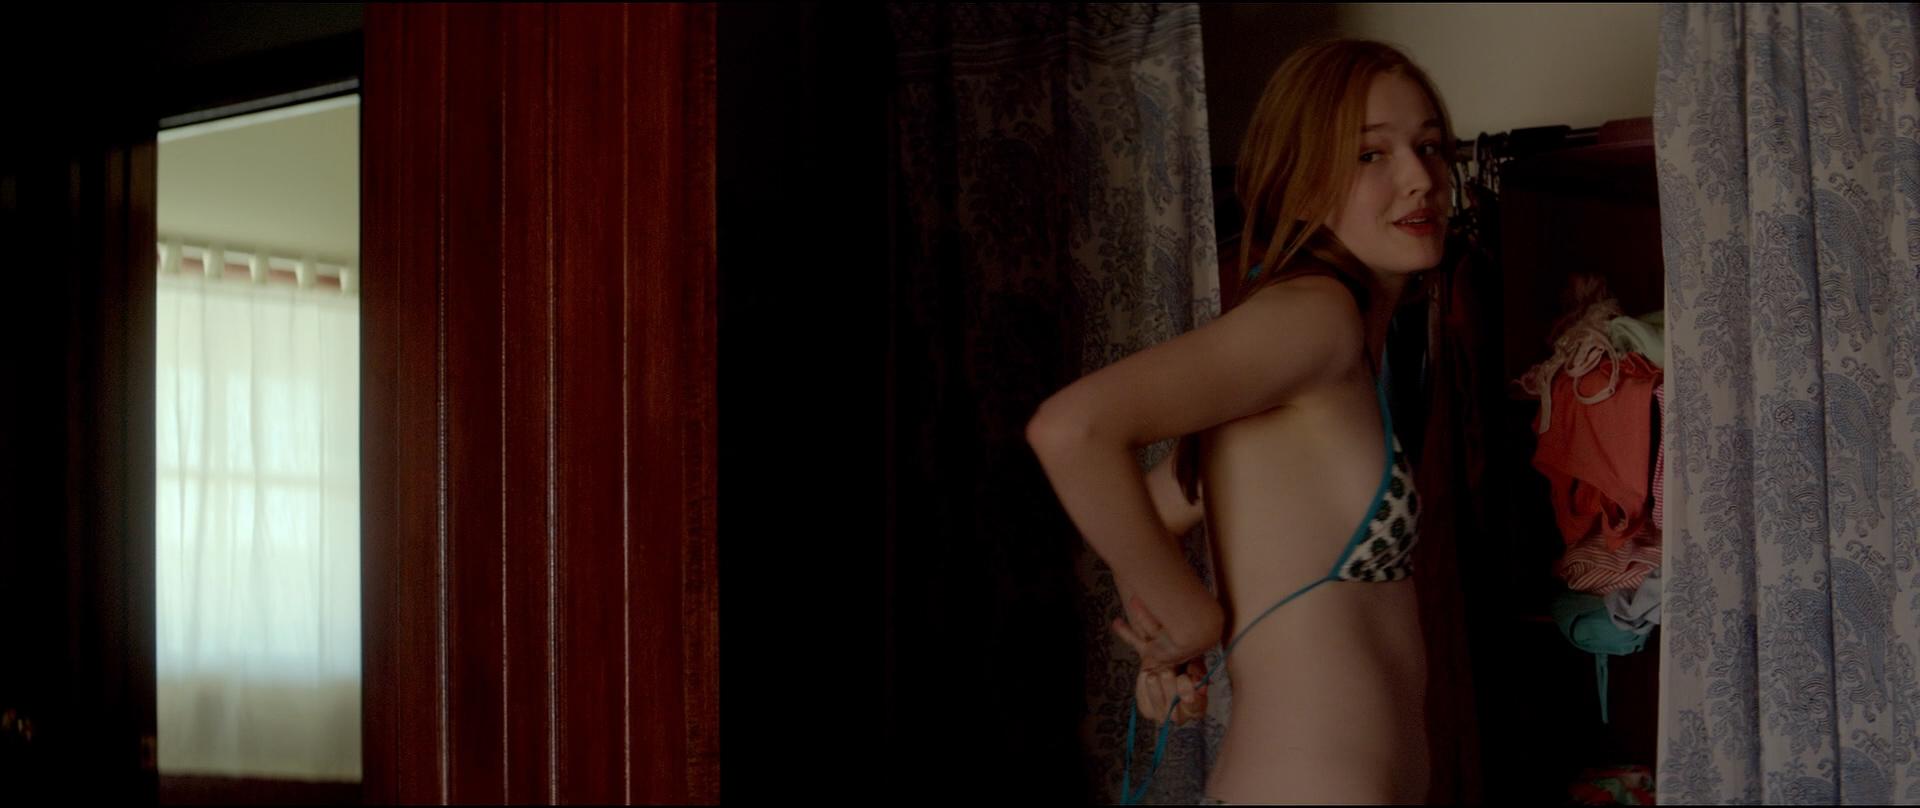 Nicole Kidman nude full frontal or bd and Madisson Brown hot - Strangerland (2015) hd1080p BluRay (10)